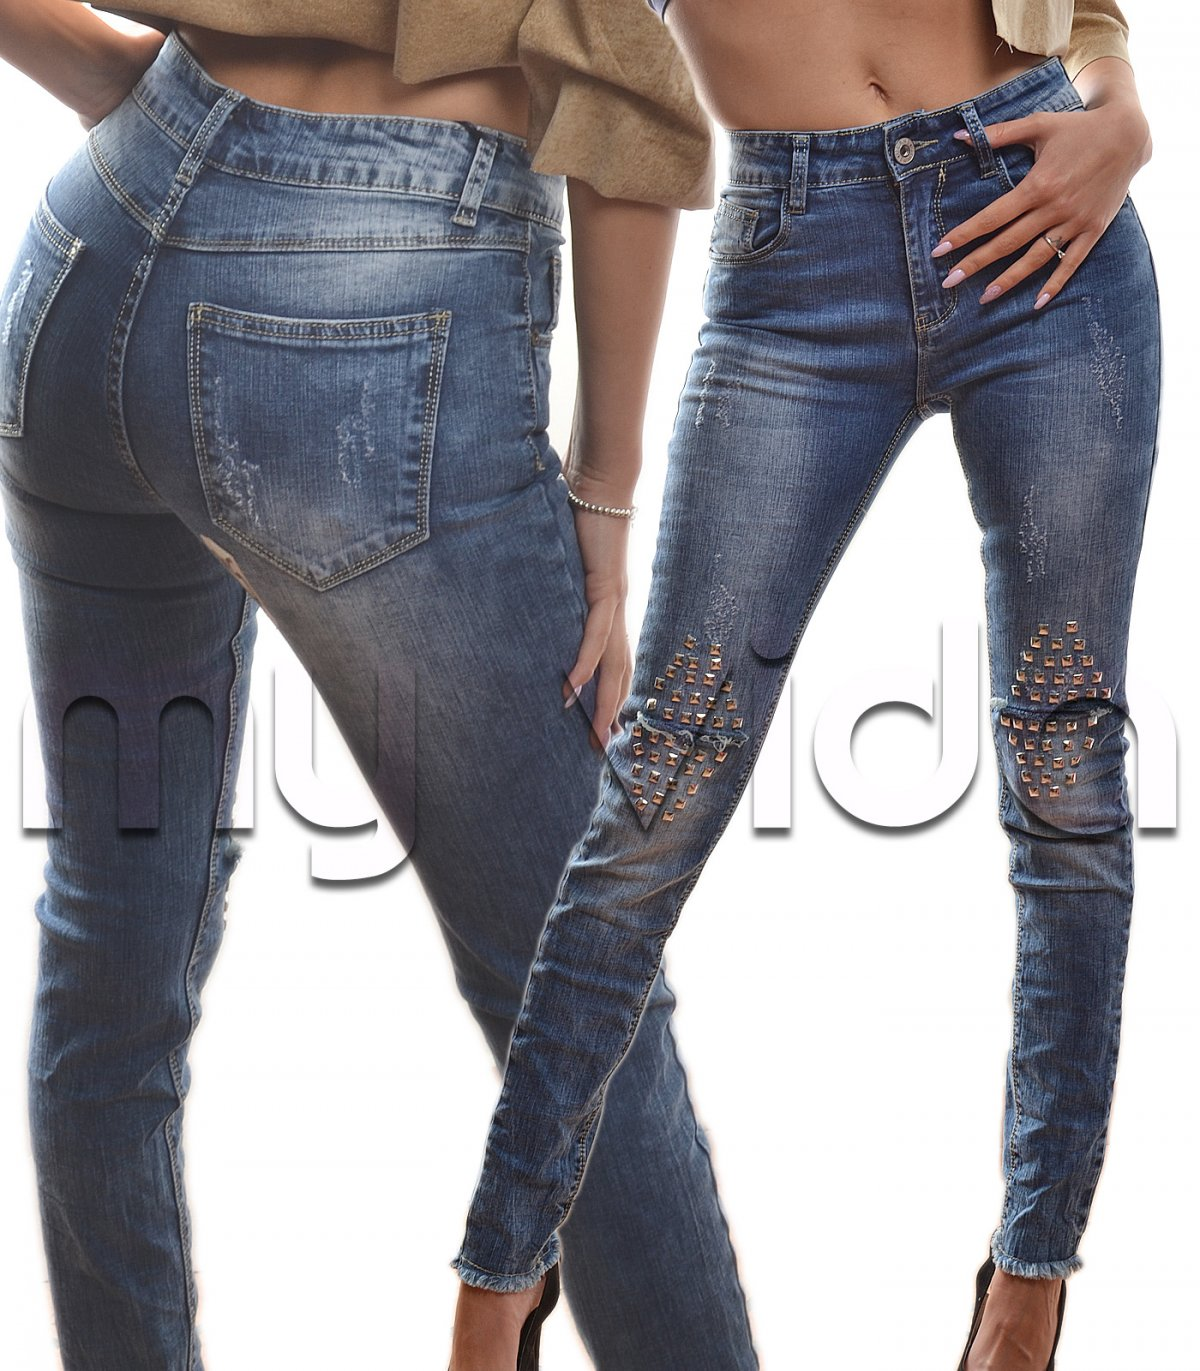 My Cinque Vida Slim Donna Skinny Tasche Fit Jeans zgqaY